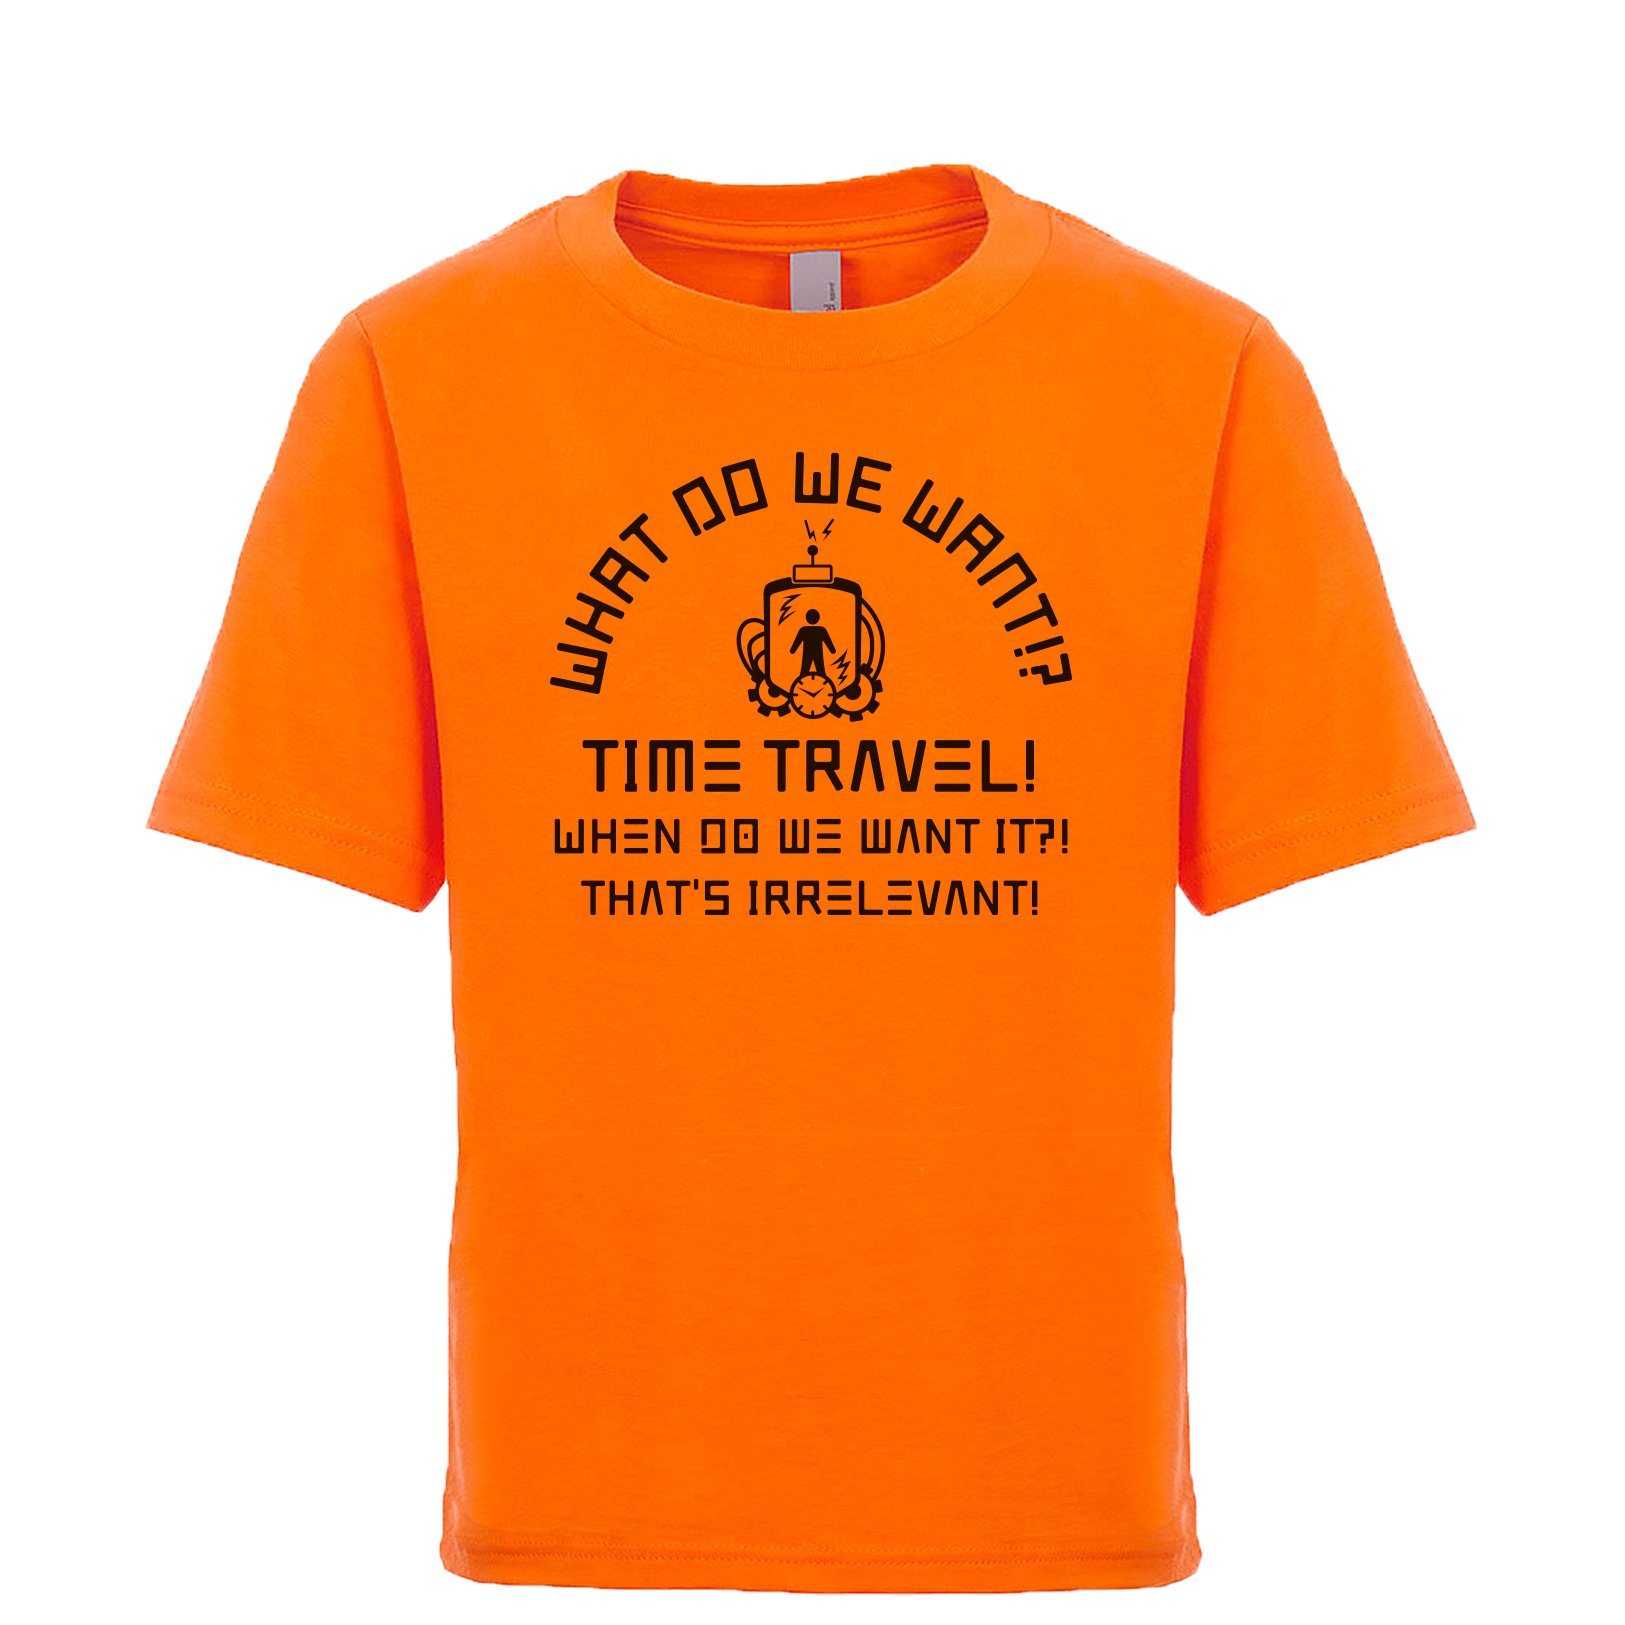 Shirtgoals What Do We Want!? Time Travel! When Do We Want It?! That's Irrelevant! Unisex Kids Tee Orange Medium